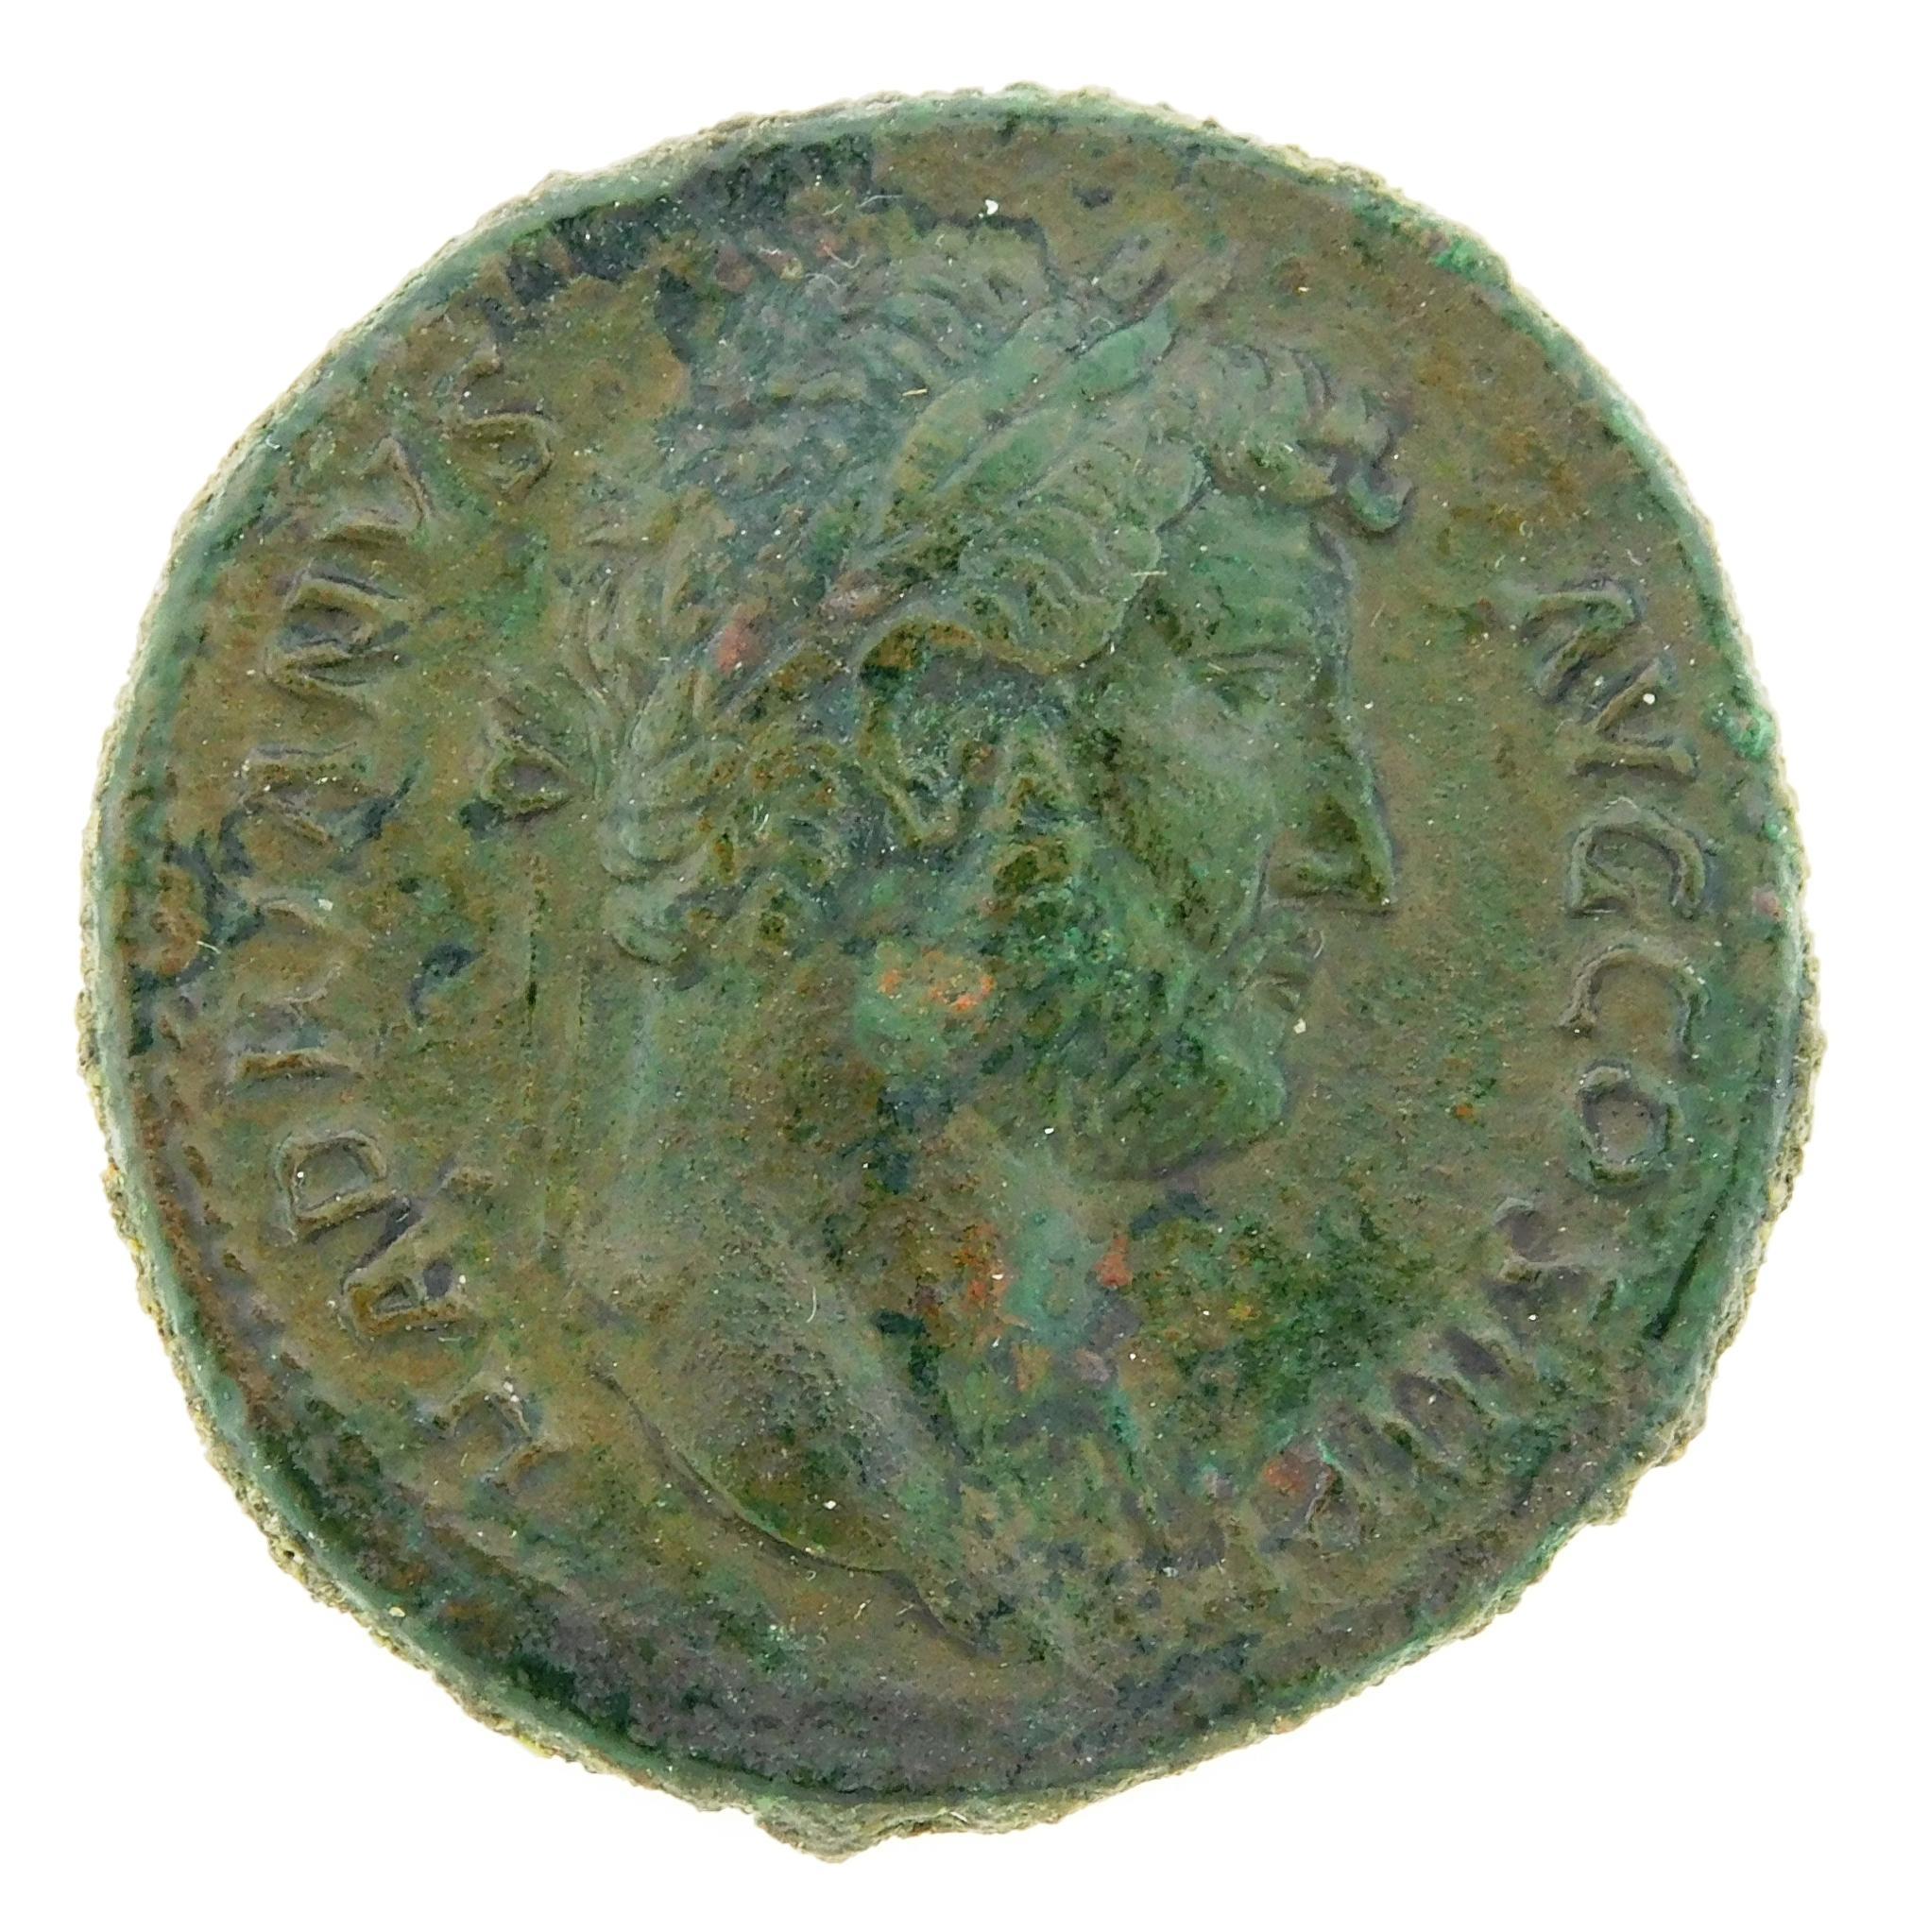 COIN: Ancient Rome. 117-138 AD Hadrian AE Sestertius. Fortuna Standing Left, RIC-759. VF. 26.18 Grams, 31.2mm [Disclaimer: Descripti...